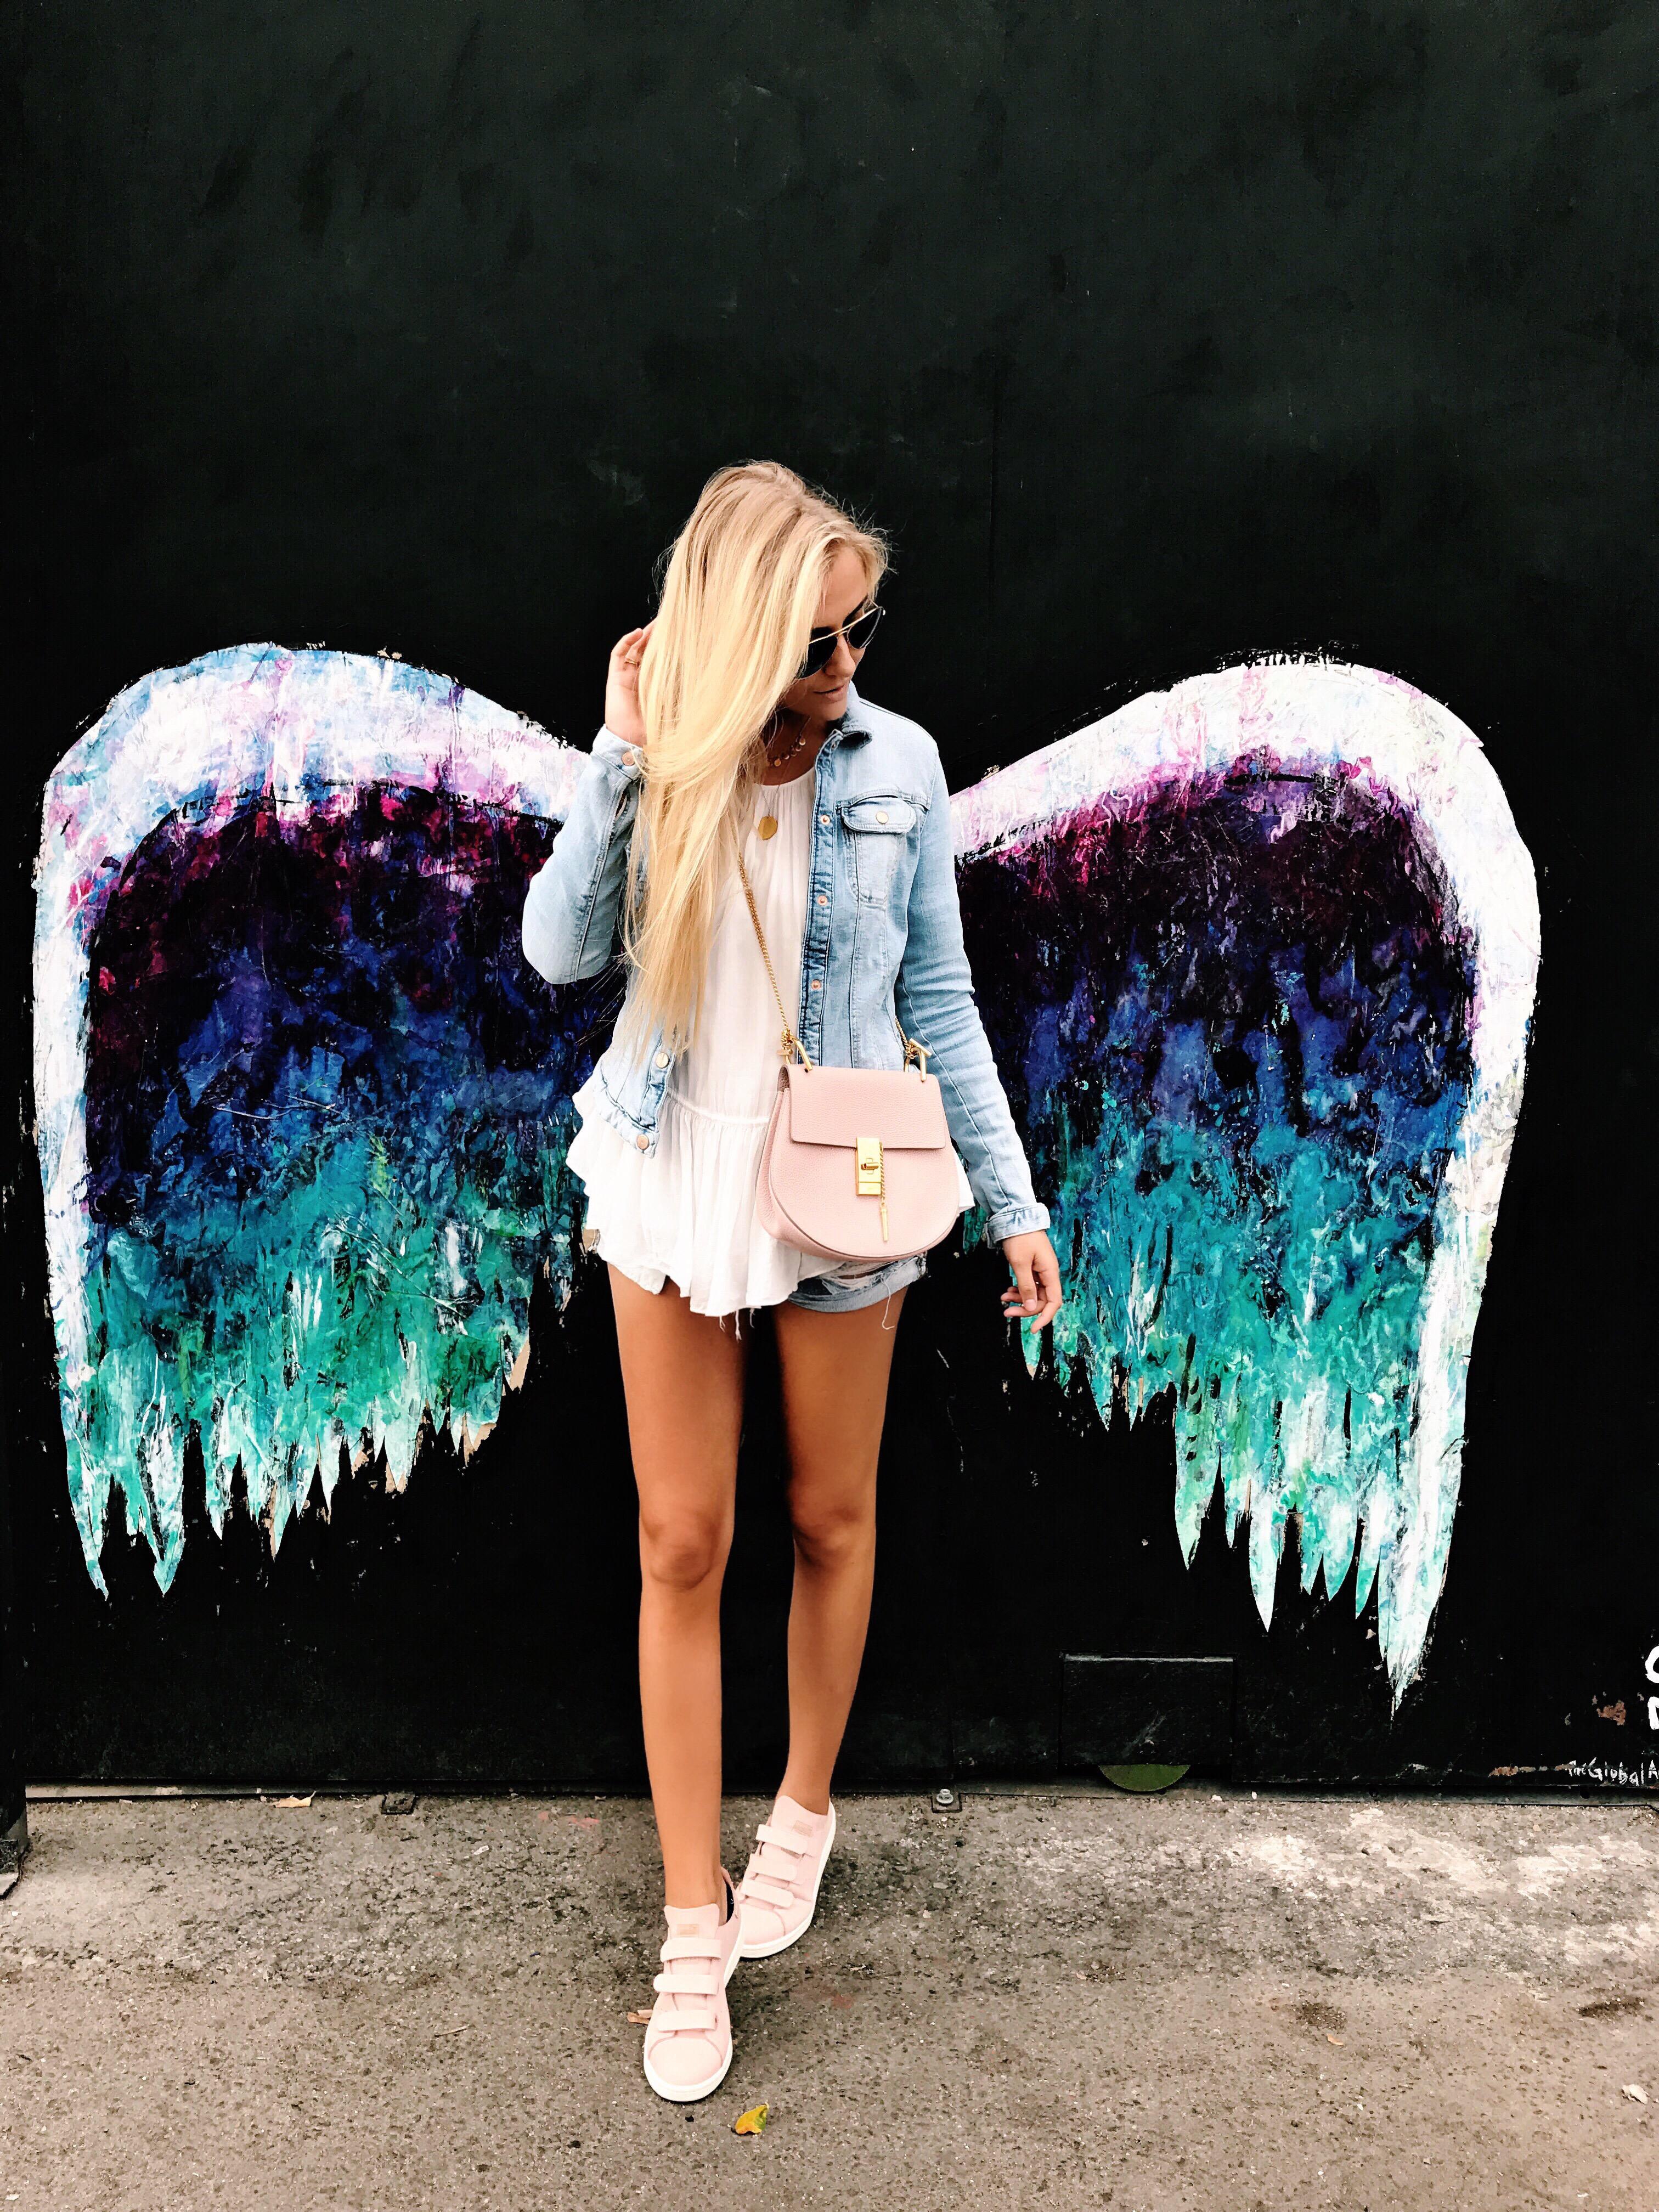 angel_wall_LA_california_angelwall